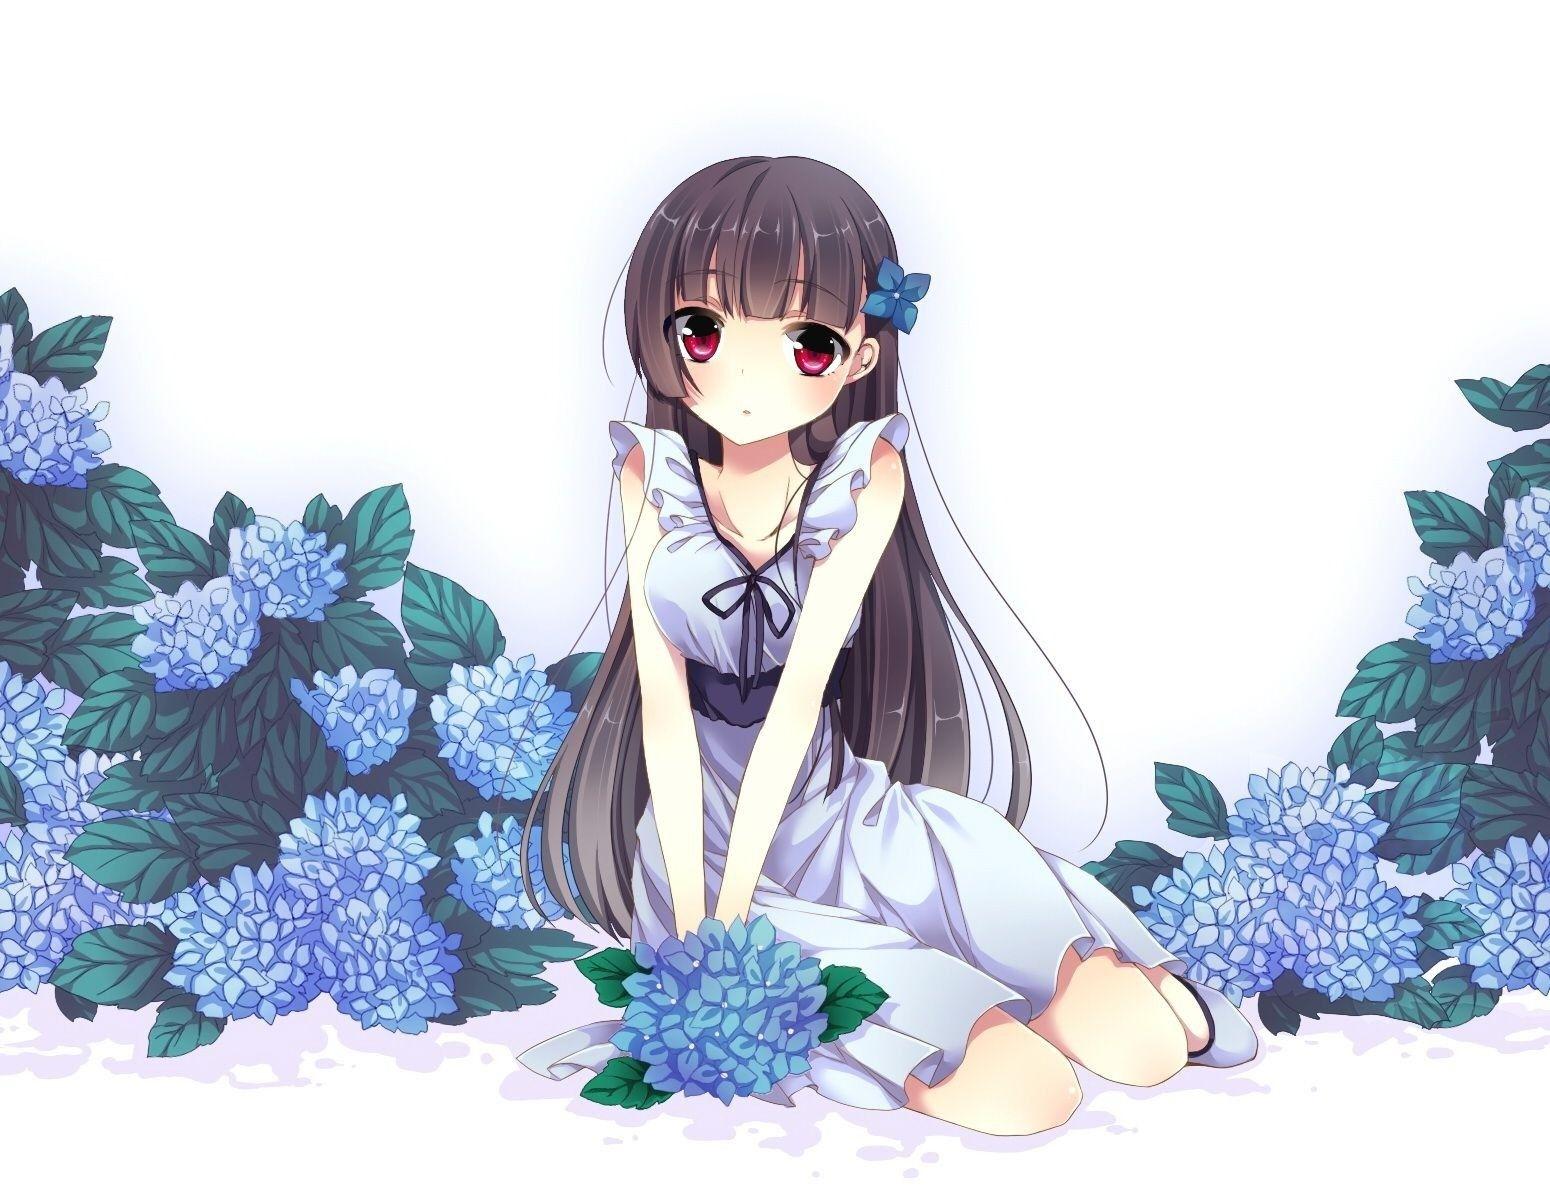 Pin de ⚘ •ᶻᵃᵐ• ⚘     en Wallpapers Anime kawaii